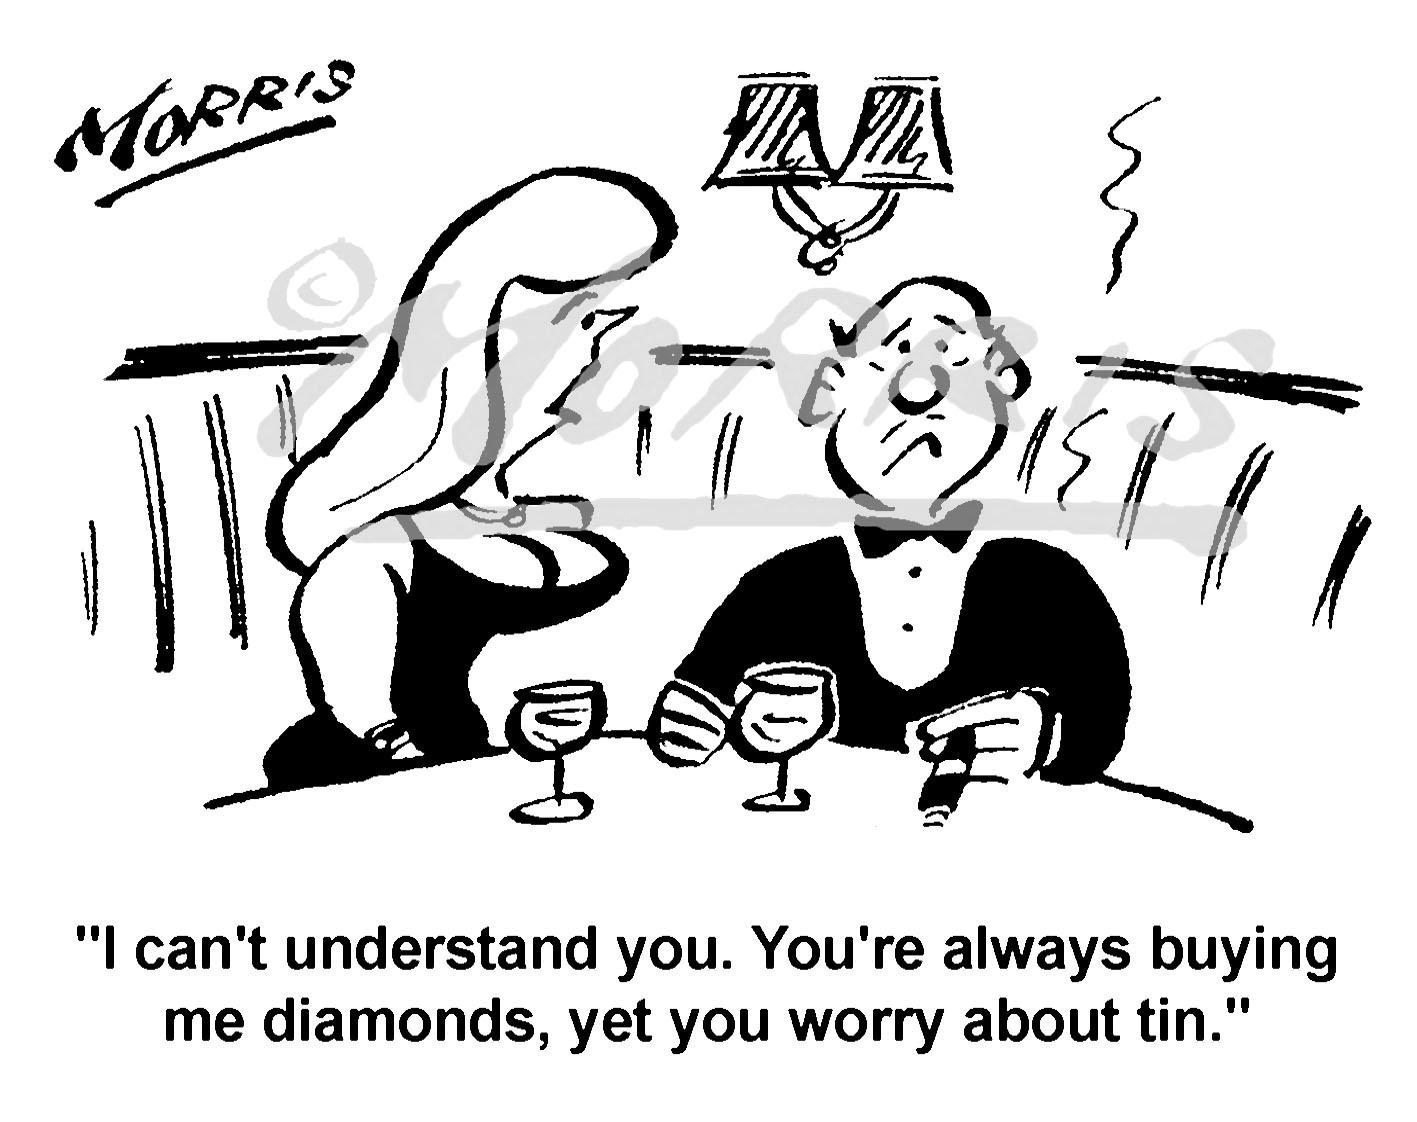 Stock market buying cartoon – Ref: 5064bw